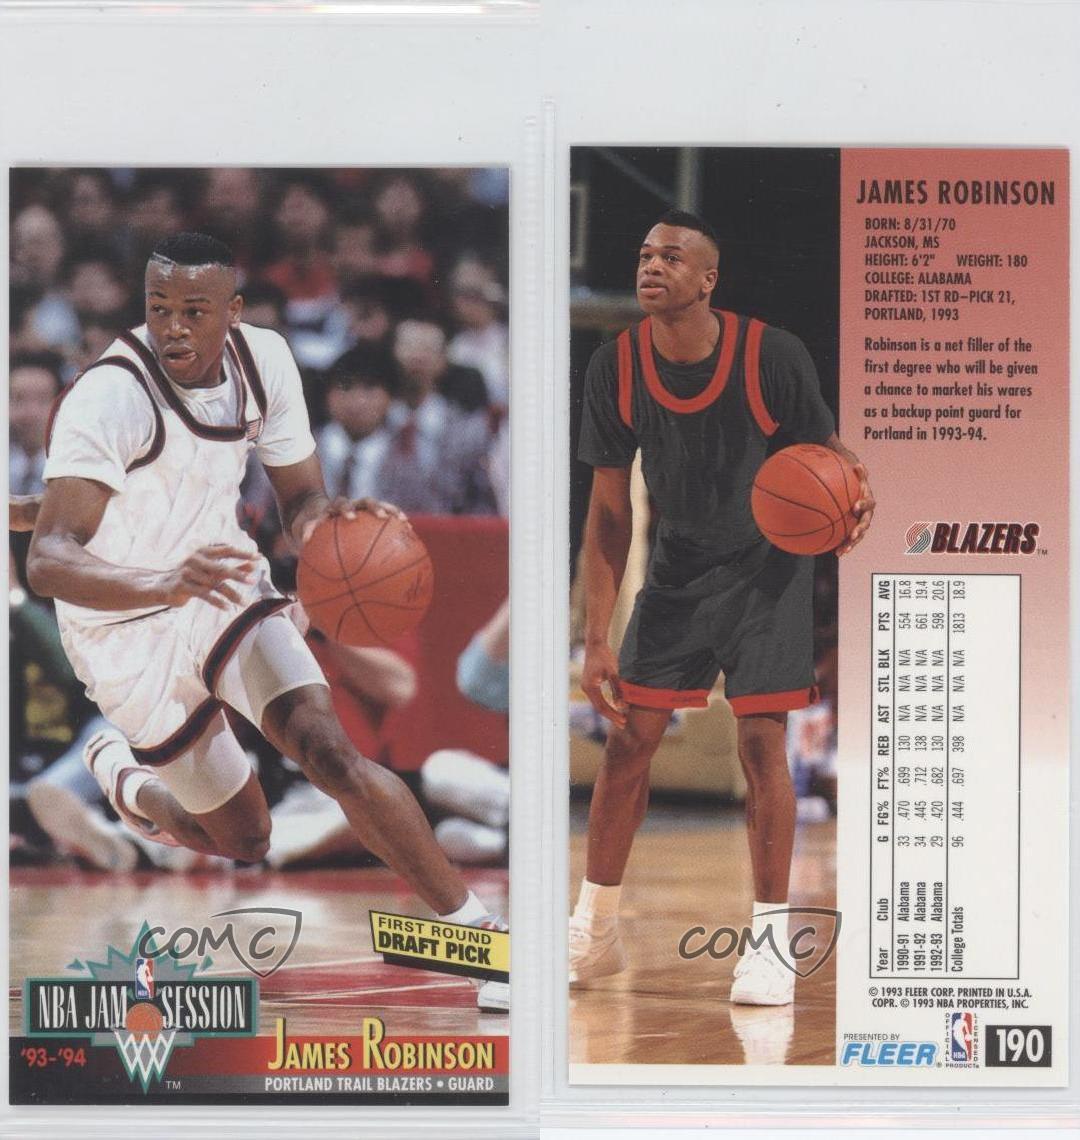 Portland Trail Blazers Roster 1992: 1993 NBA Jam Session #190 James Robinson Portland Trail